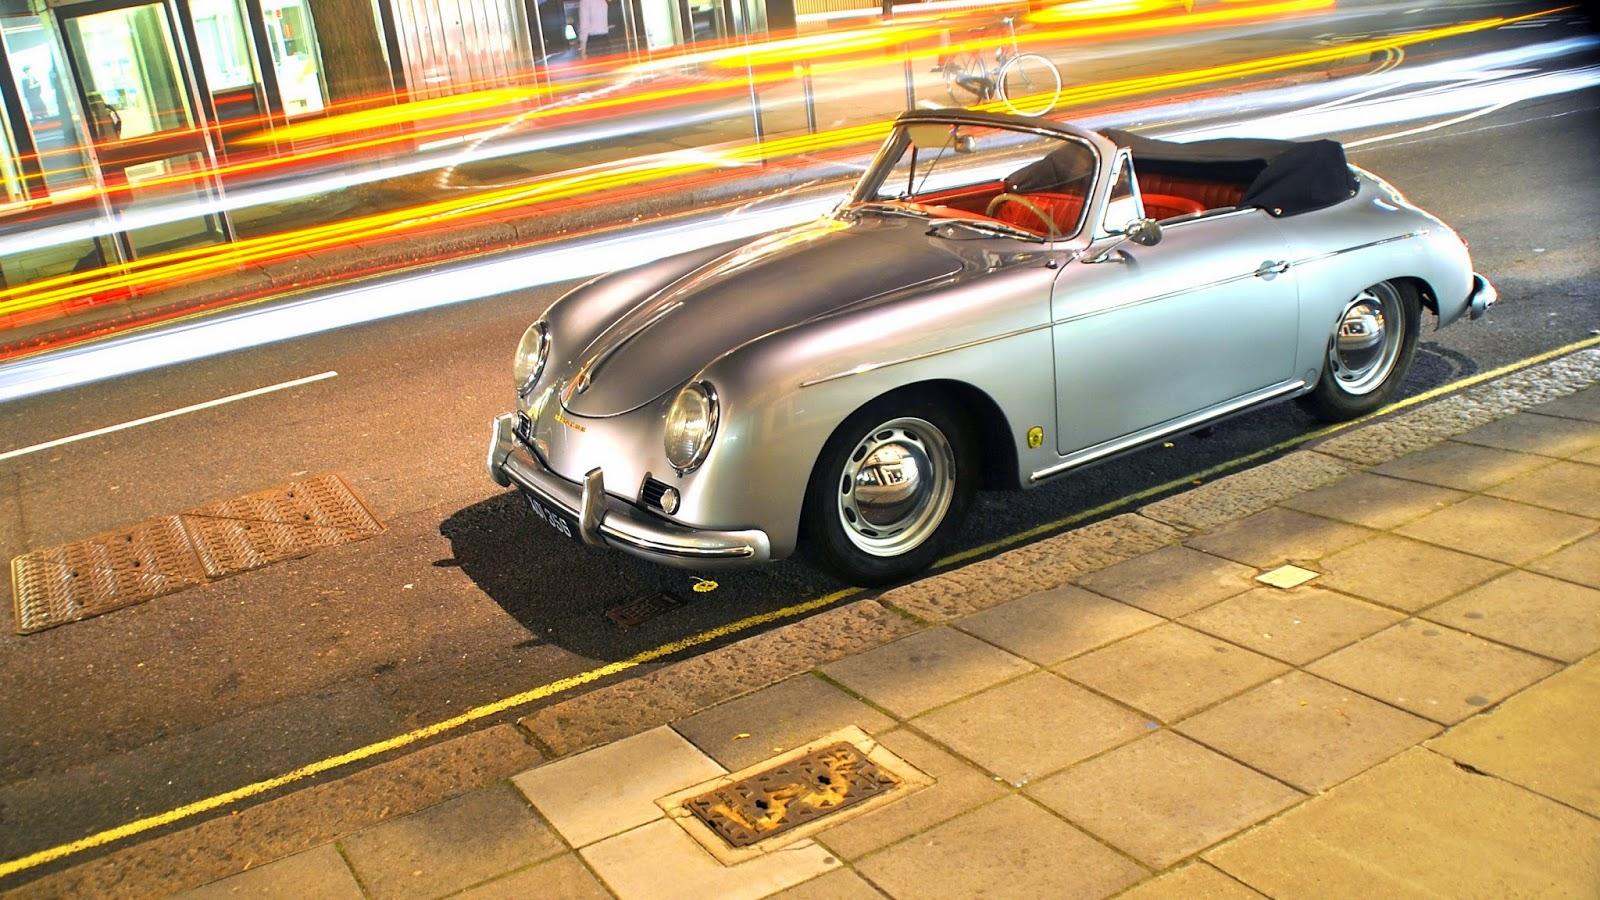 http://carbrandsincurrentproduction.blogspot.com.es/search/label/Porsche%20356%20Replica